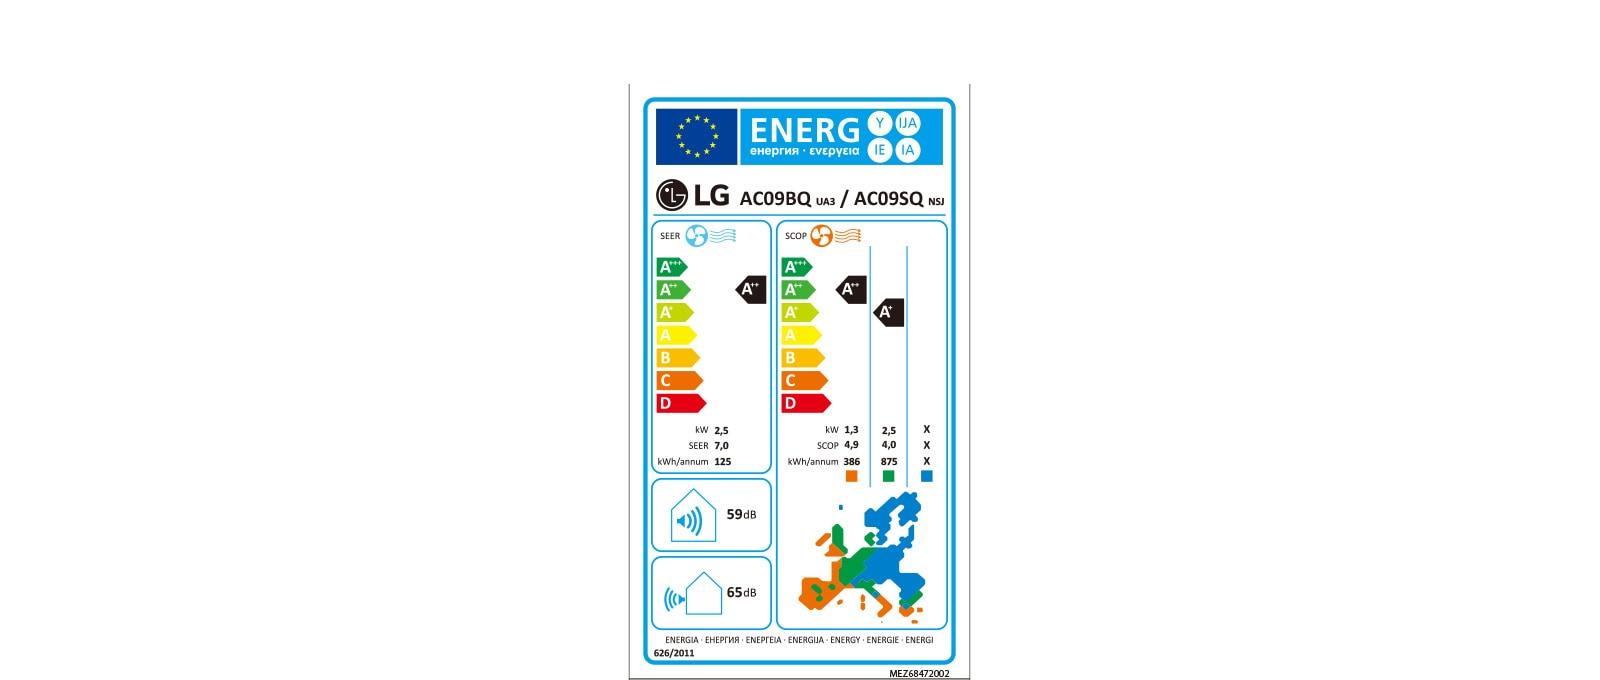 AC09SQ-energy-labels-D